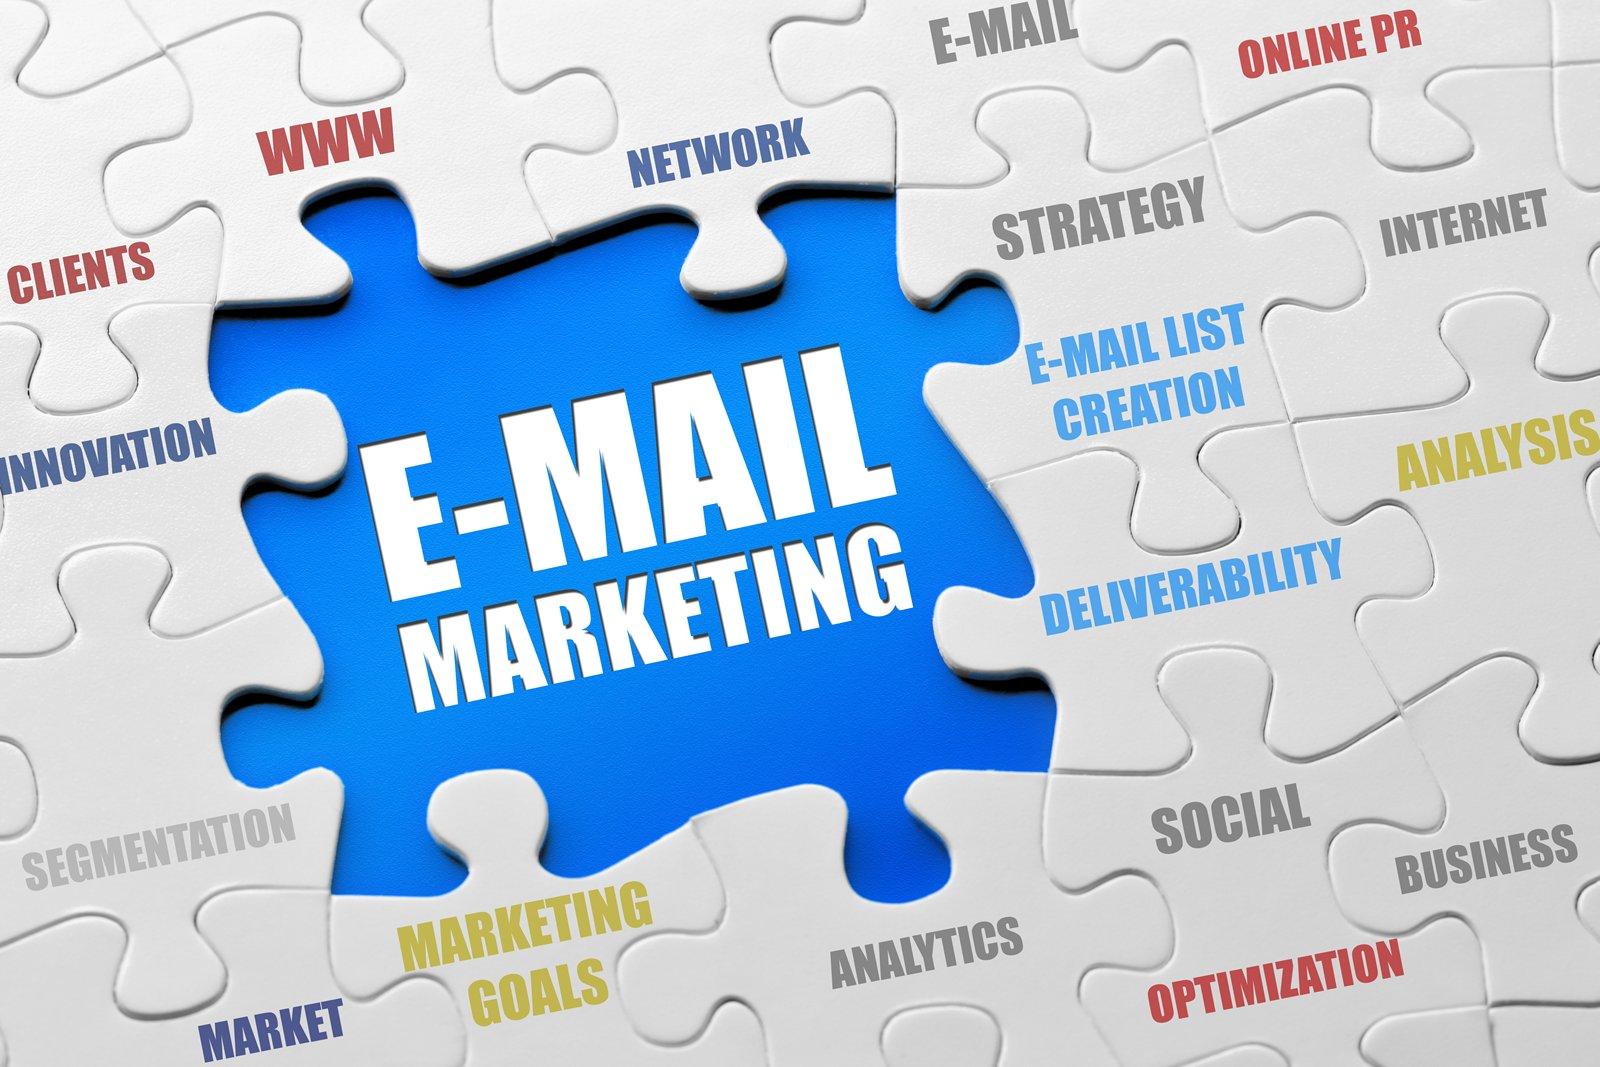 Email Marketing - Brand LoyaltyHigh Return on InvestmentCustomer Retention